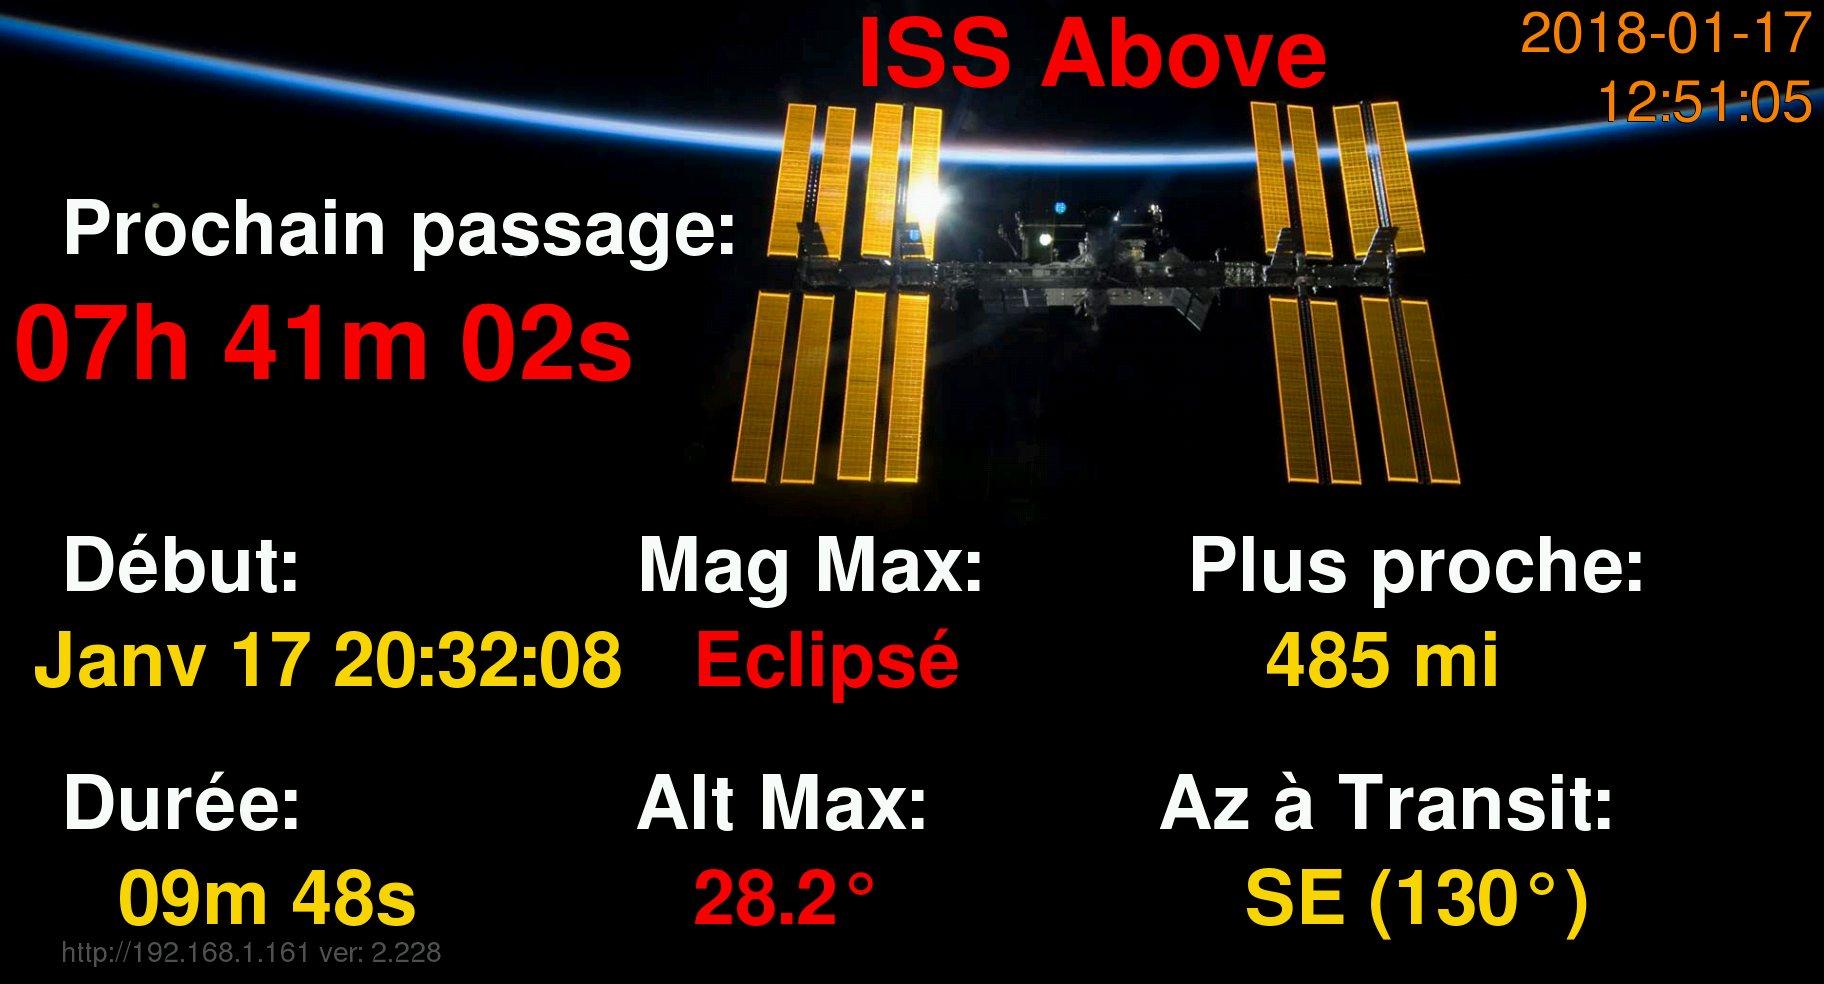 01_Next Pass_-2018-01-17_12.51.05.981412.jpg